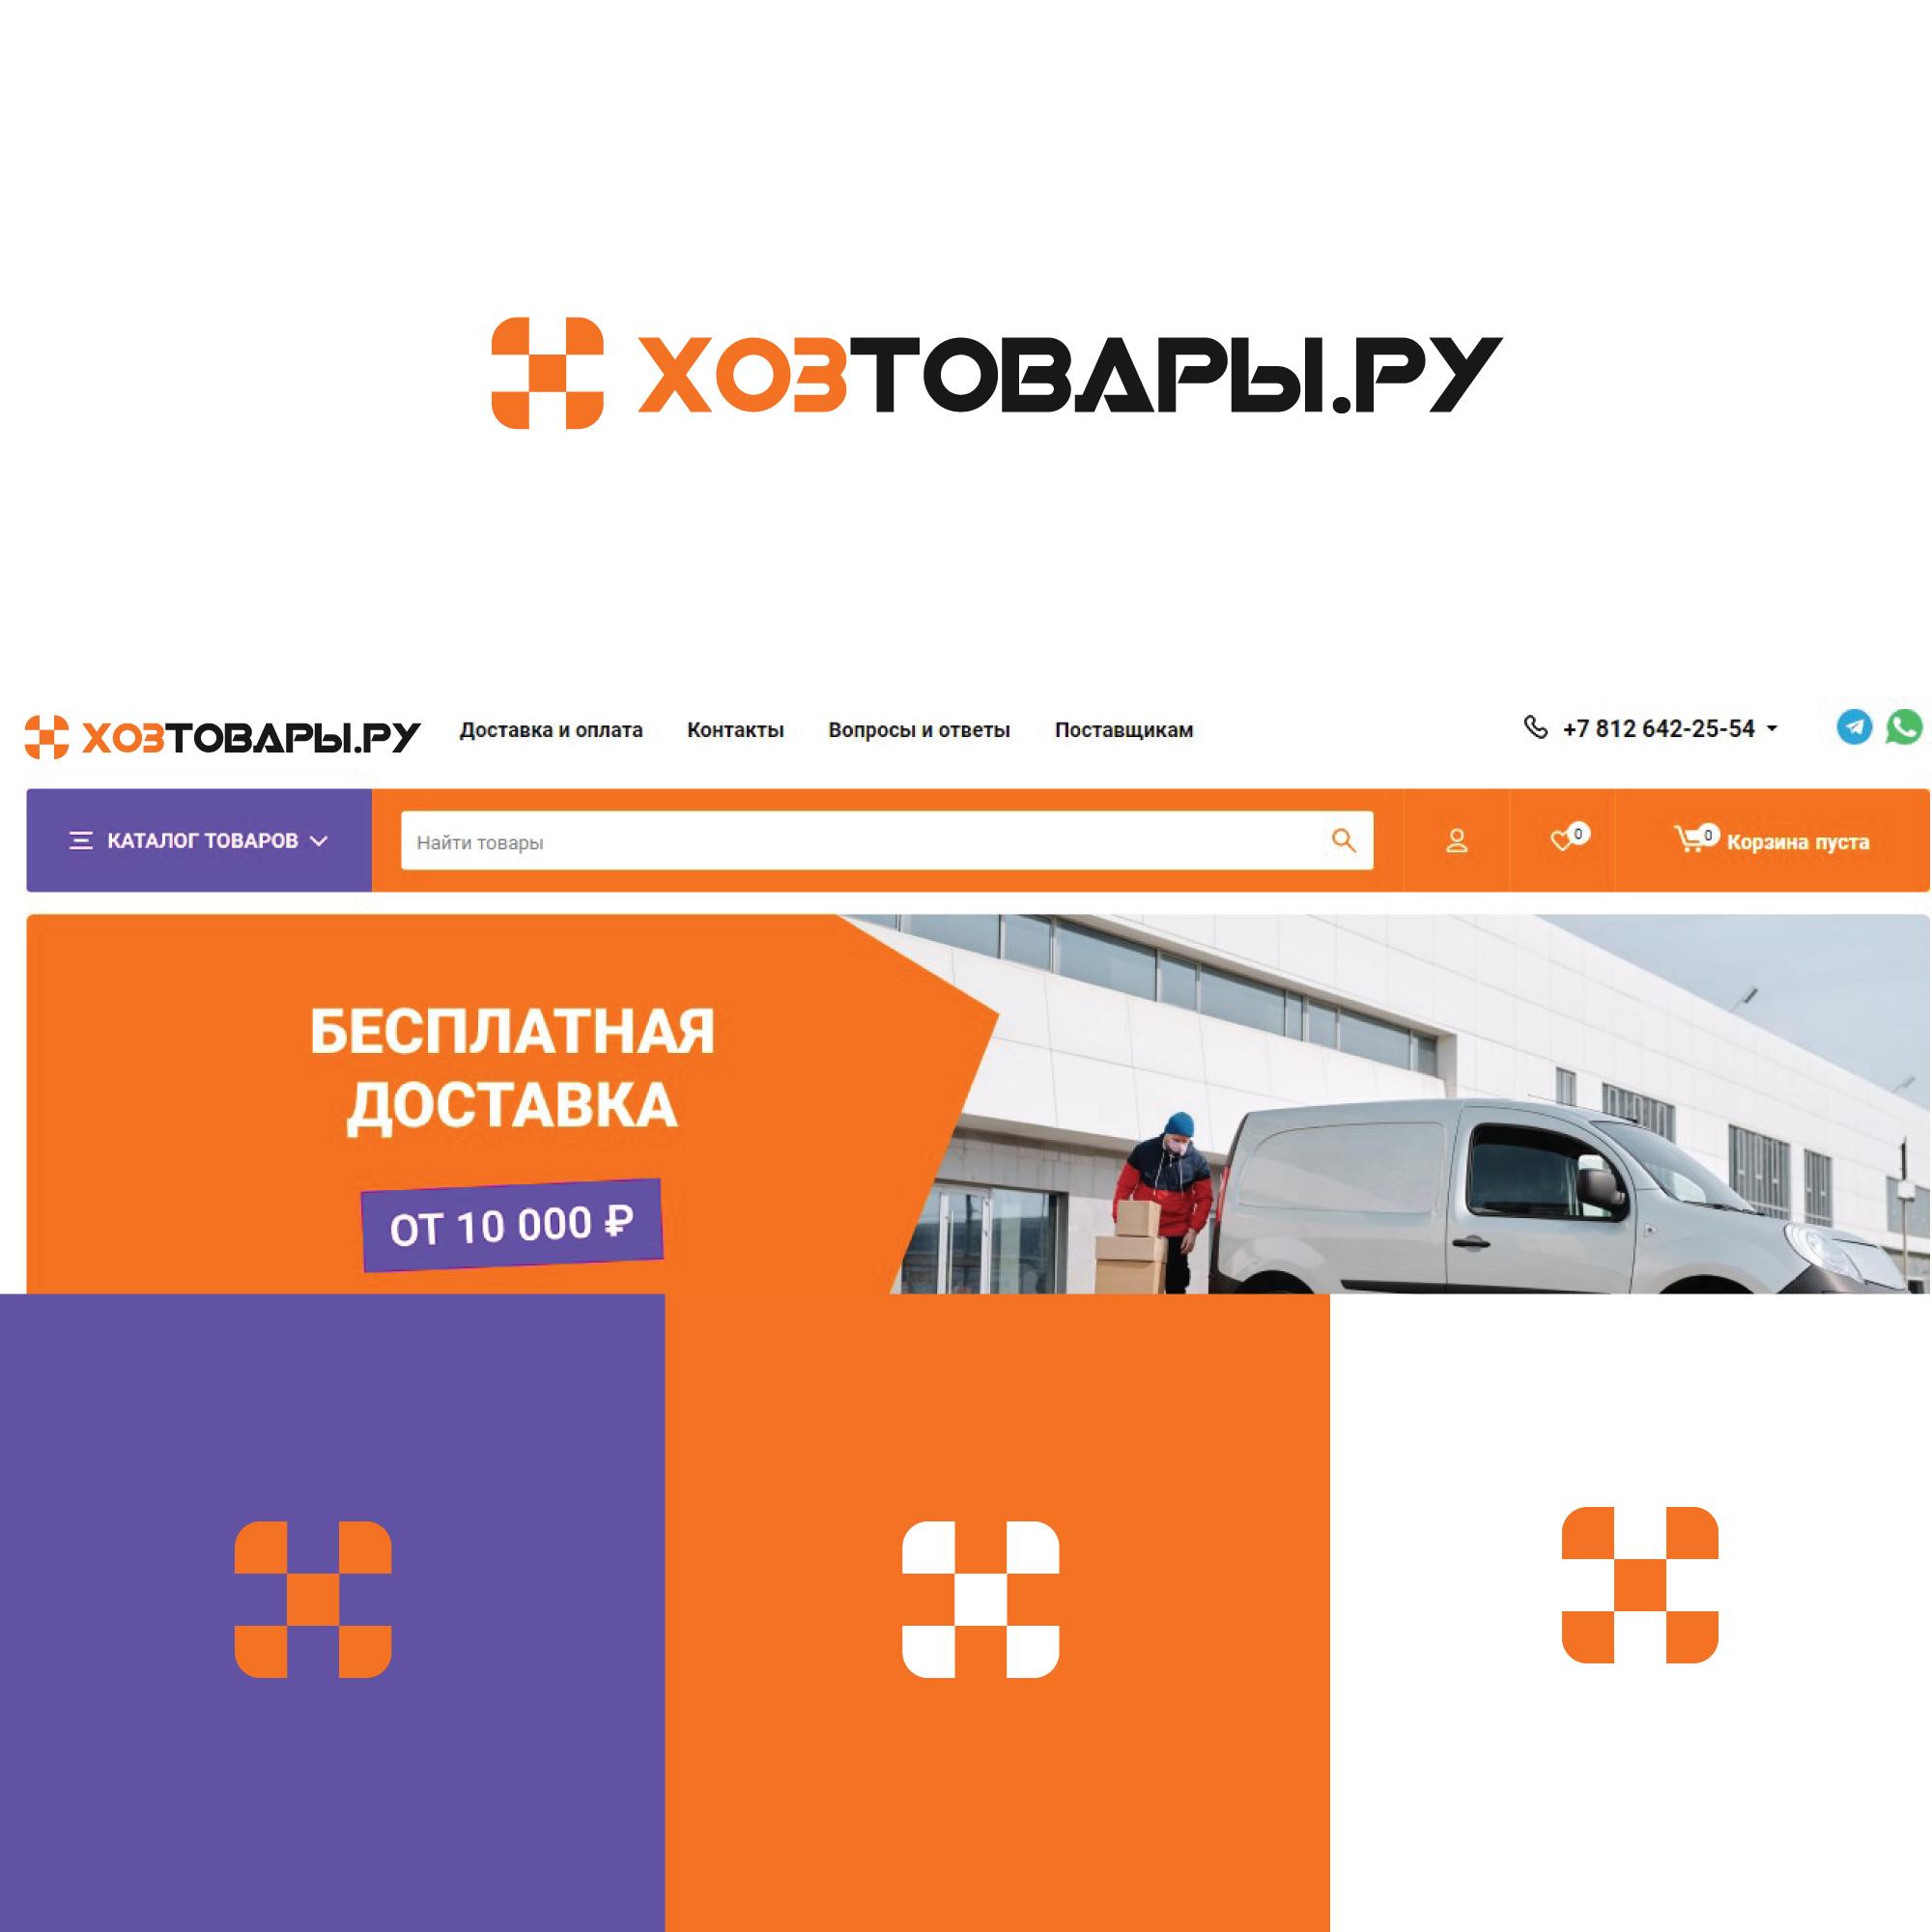 Разработка логотипа для оптового интернет-магазина «Хозтовары.ру» фото f_155608a65e720ff4.jpg